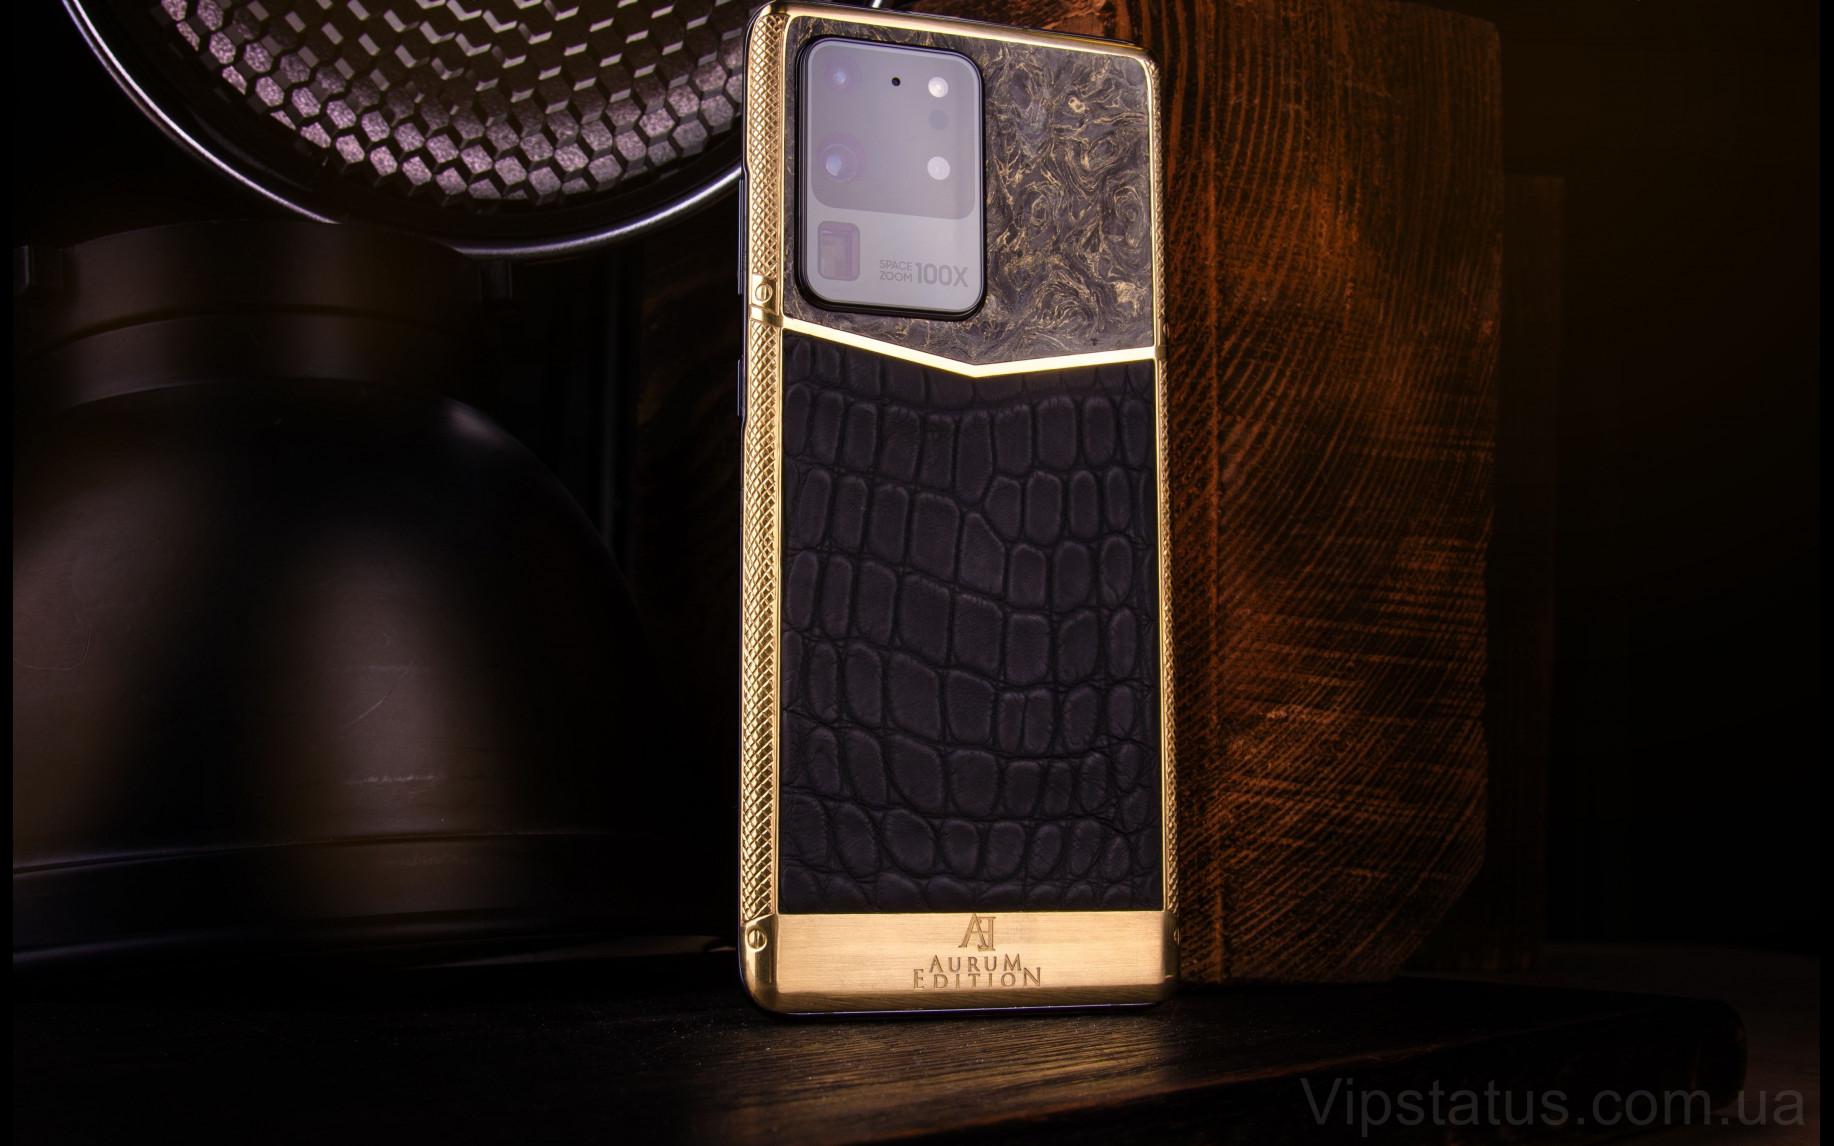 Elite Samsung S20 Gold Star Samsung S20 Gold Star image 6